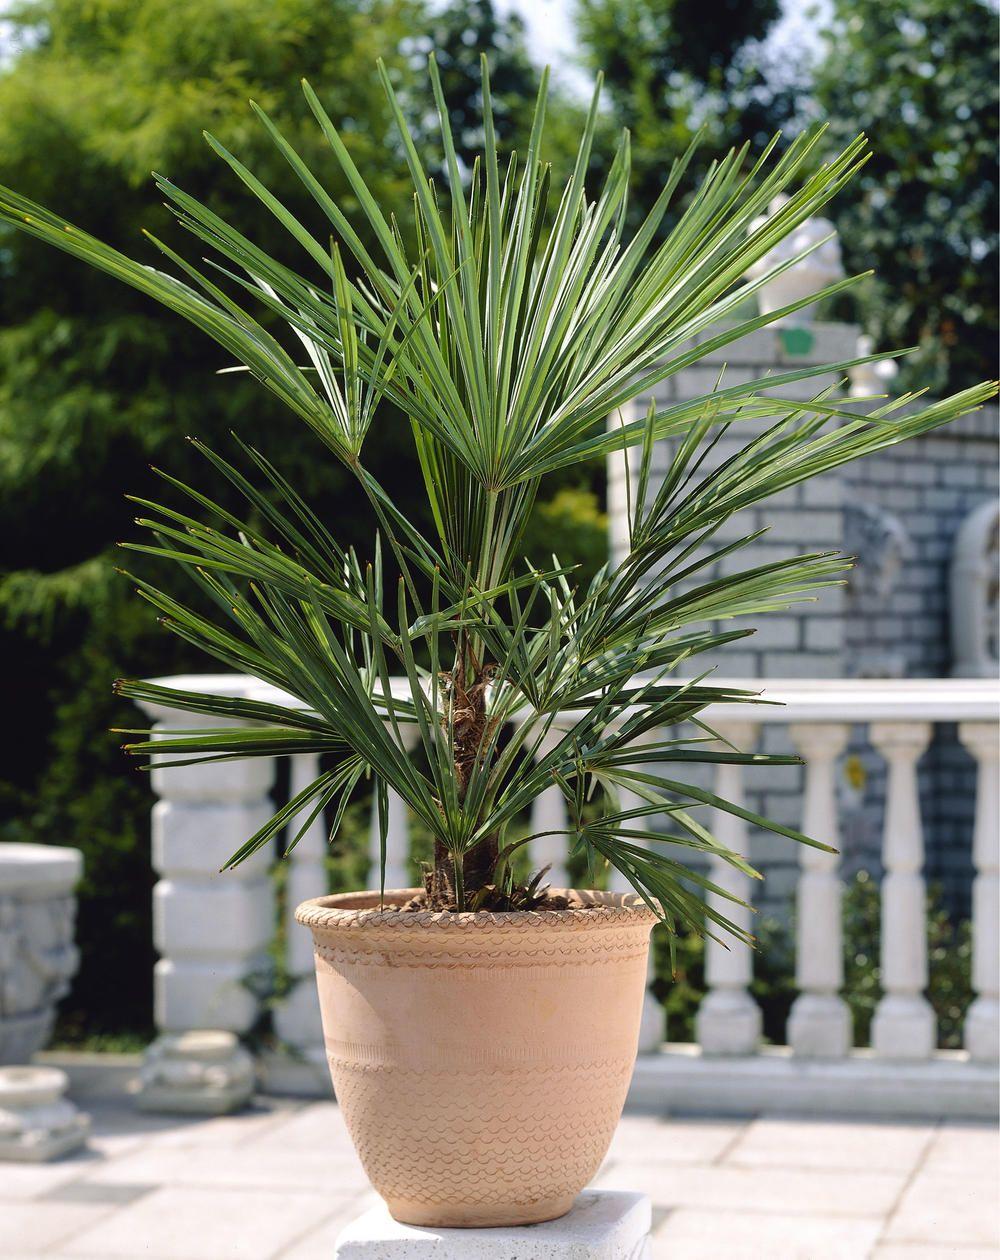 Washingtonia Robusta Die Petticoatpalme Palmen Garten Garten Pflanzen Garten